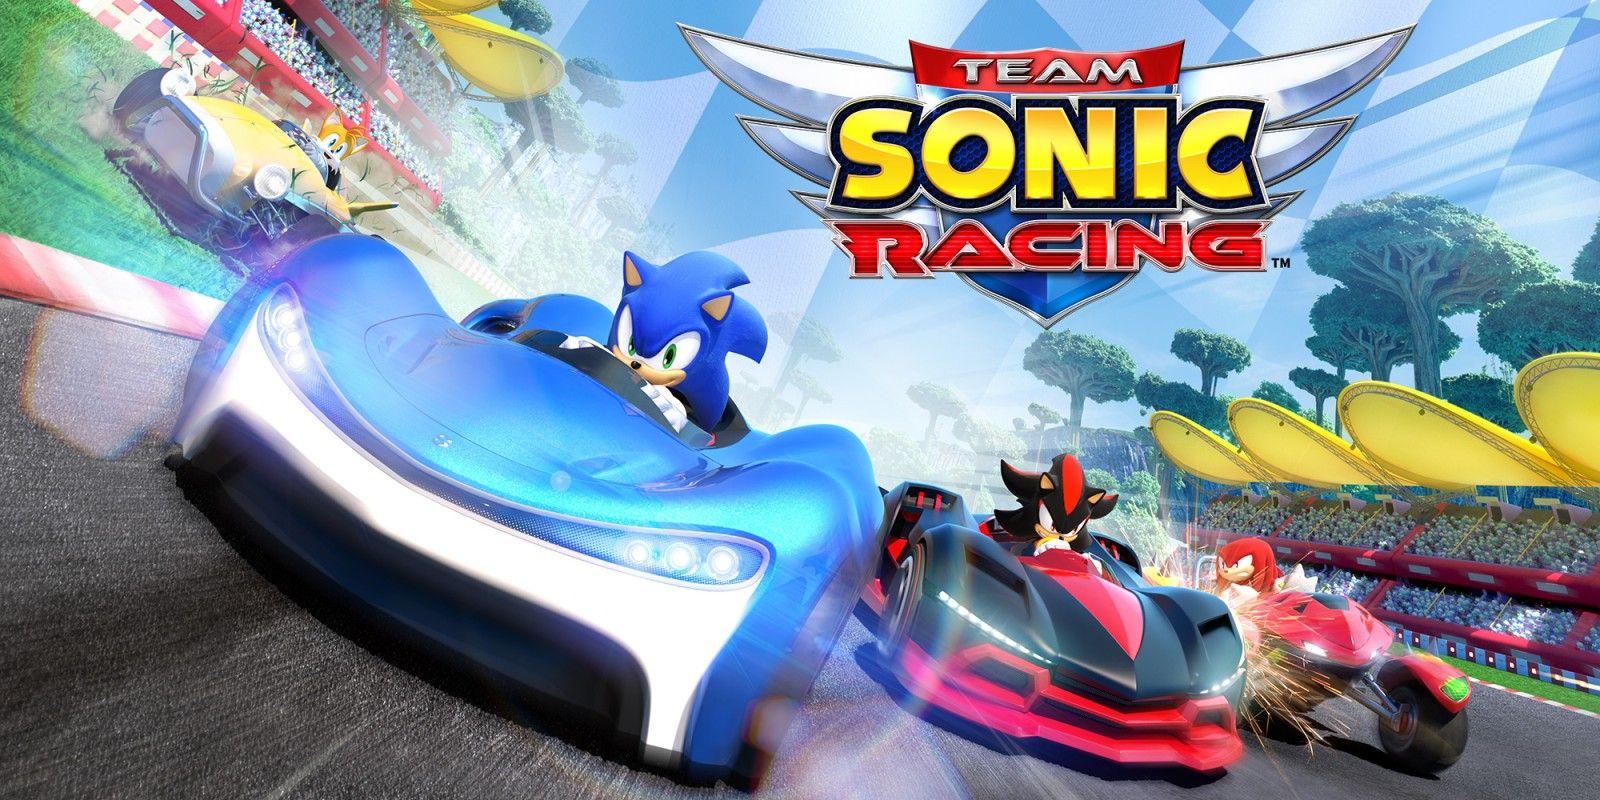 Team Sonic Racing Switch digital copy £24.49 @ Nintendo eShop